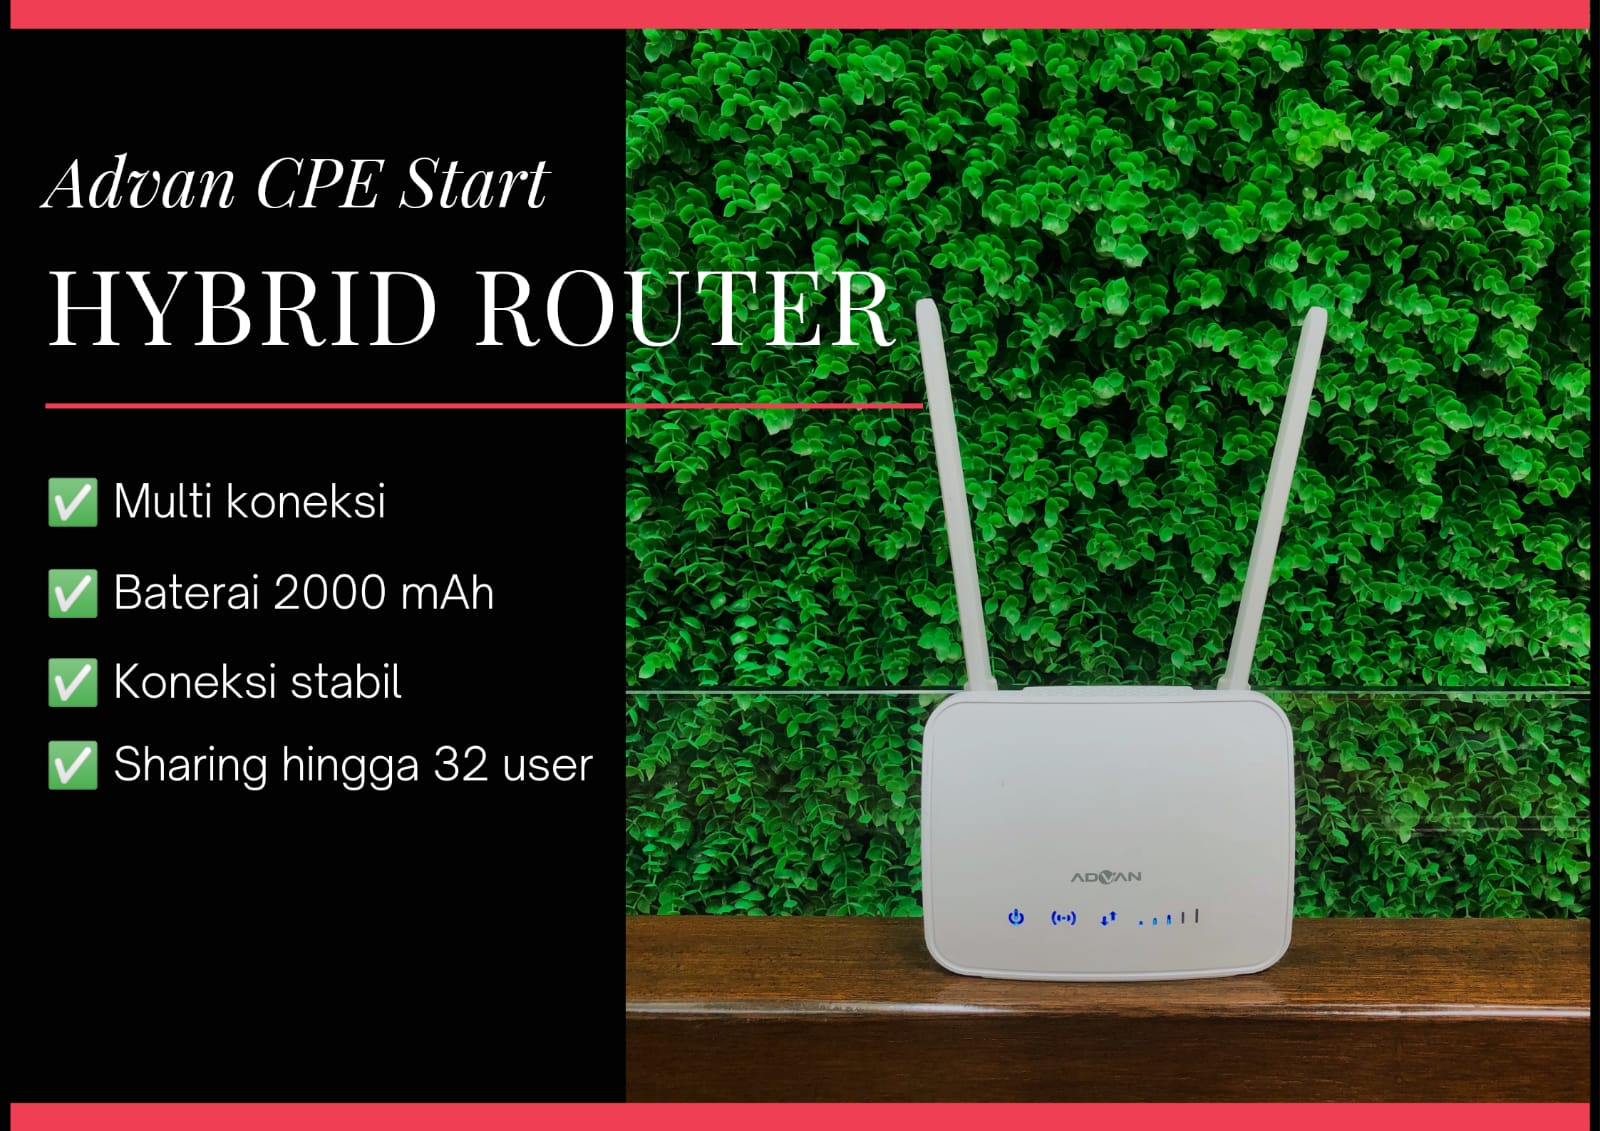 Hybrid Router